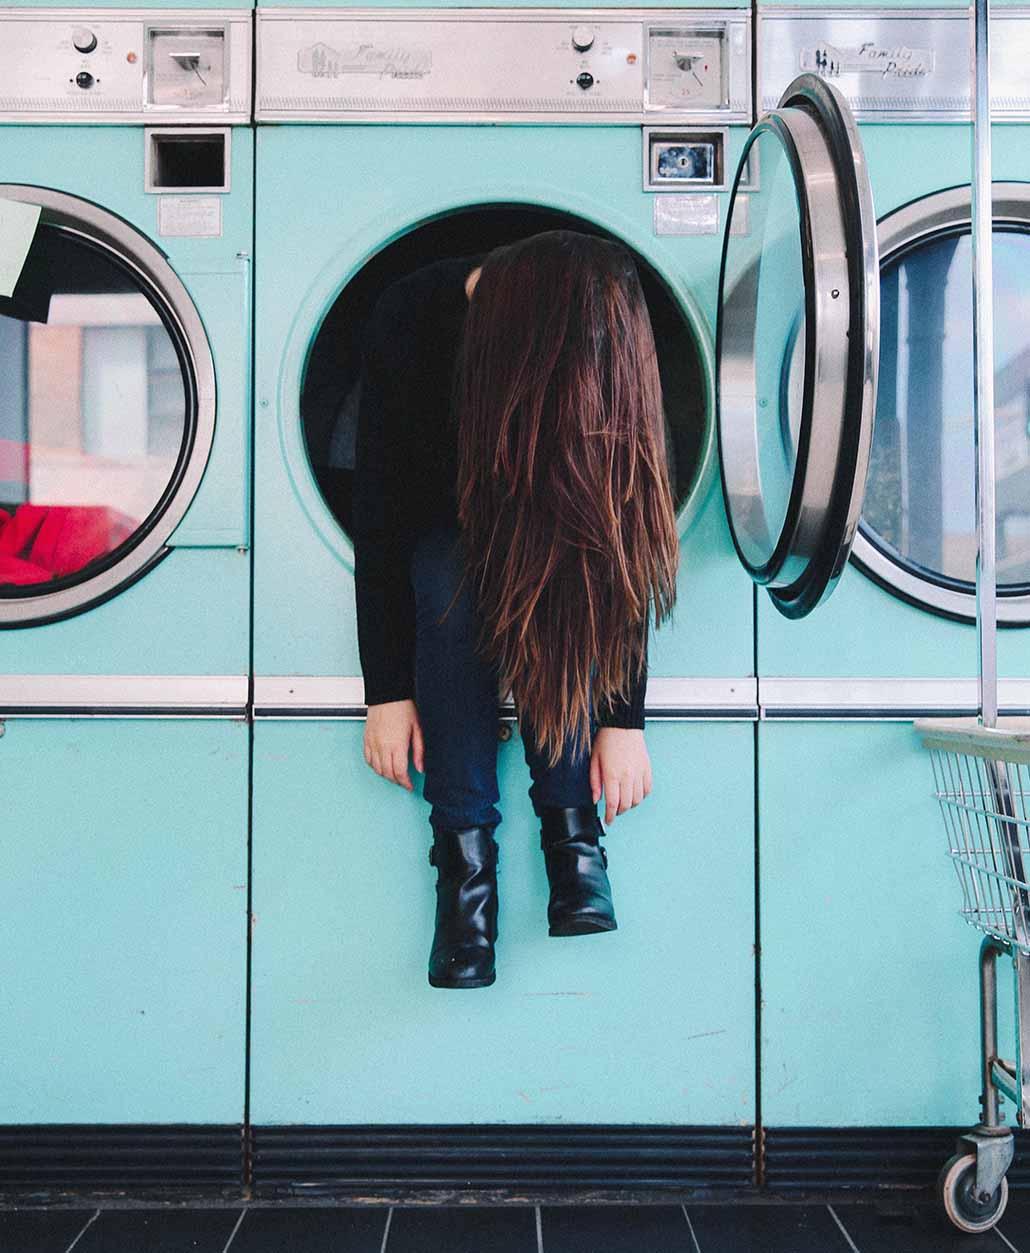 insta_laundry_post